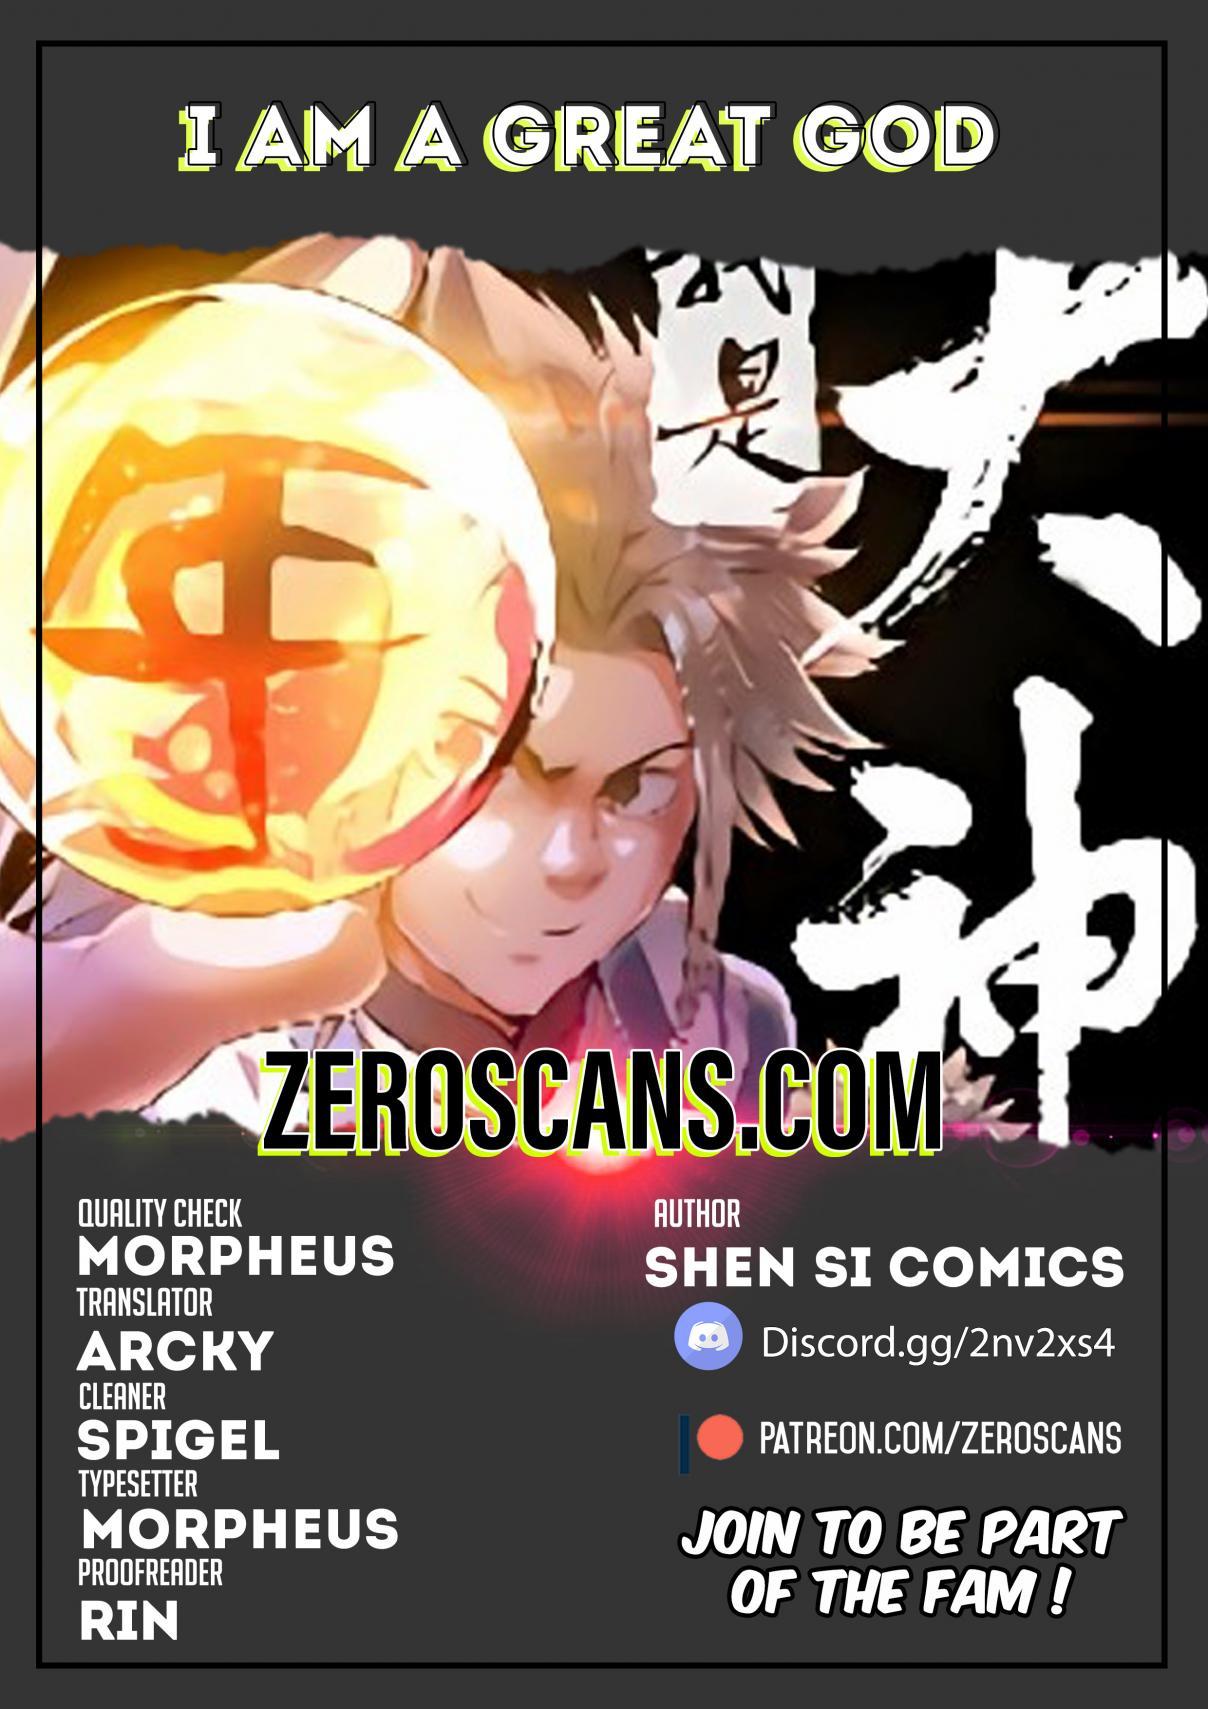 https://im.nineanime.com/comics/pic9/4/21124/491108/c0f9e3a82853383bf86339603c2f0996.jpg Page 1